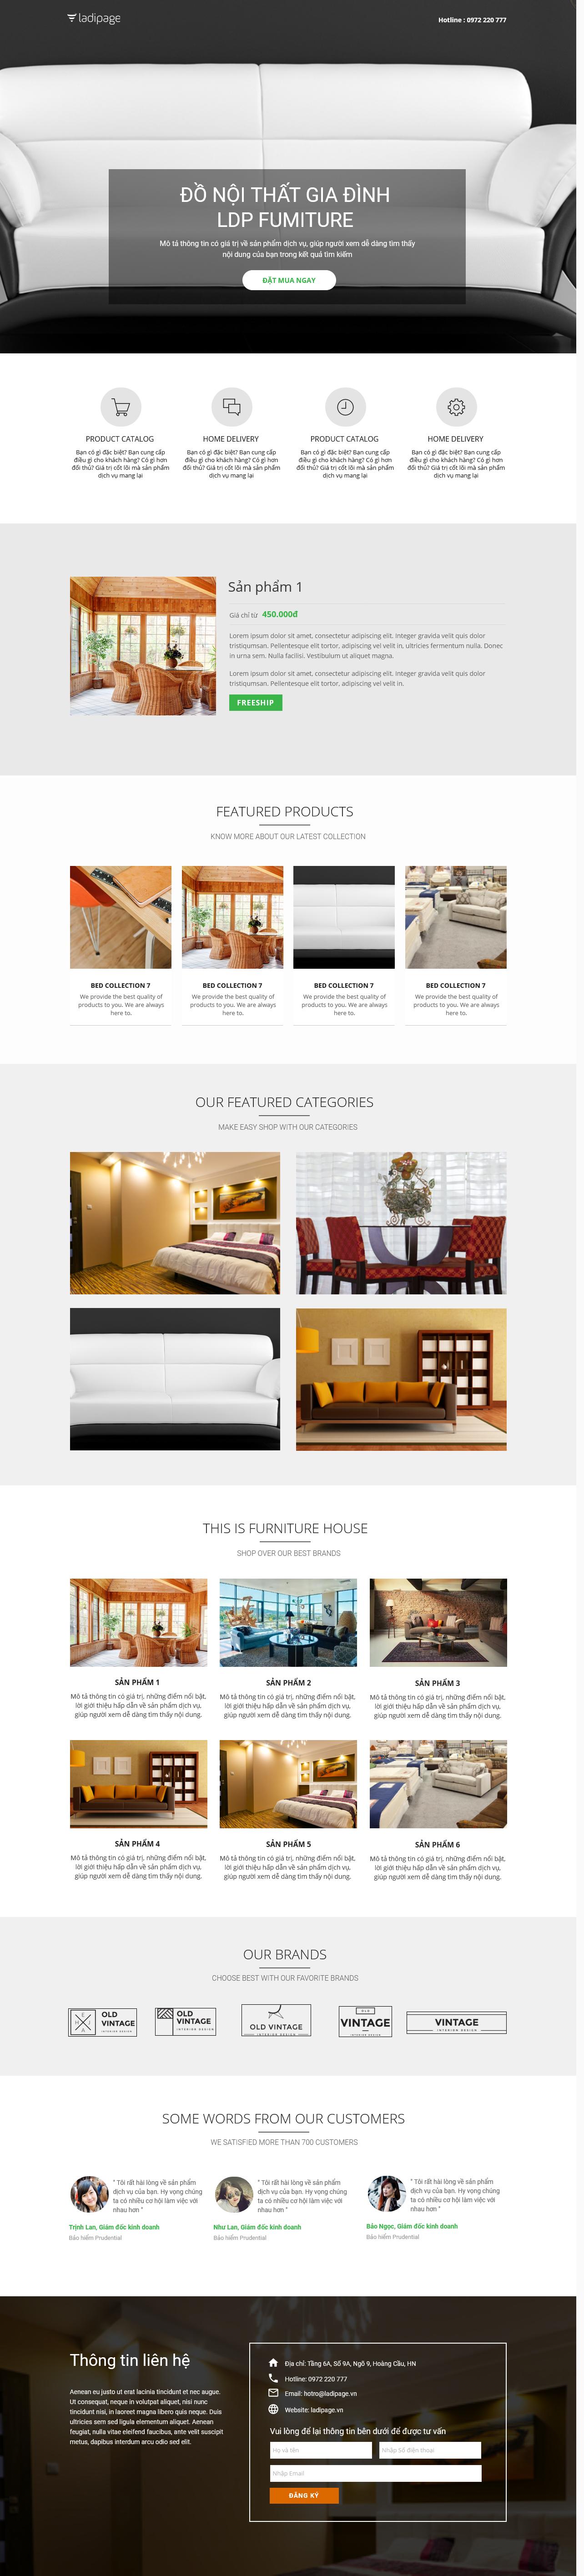 Thiết kế website Thiết kế webiste landingpage noi-that---ngoai-that Nội thất 11